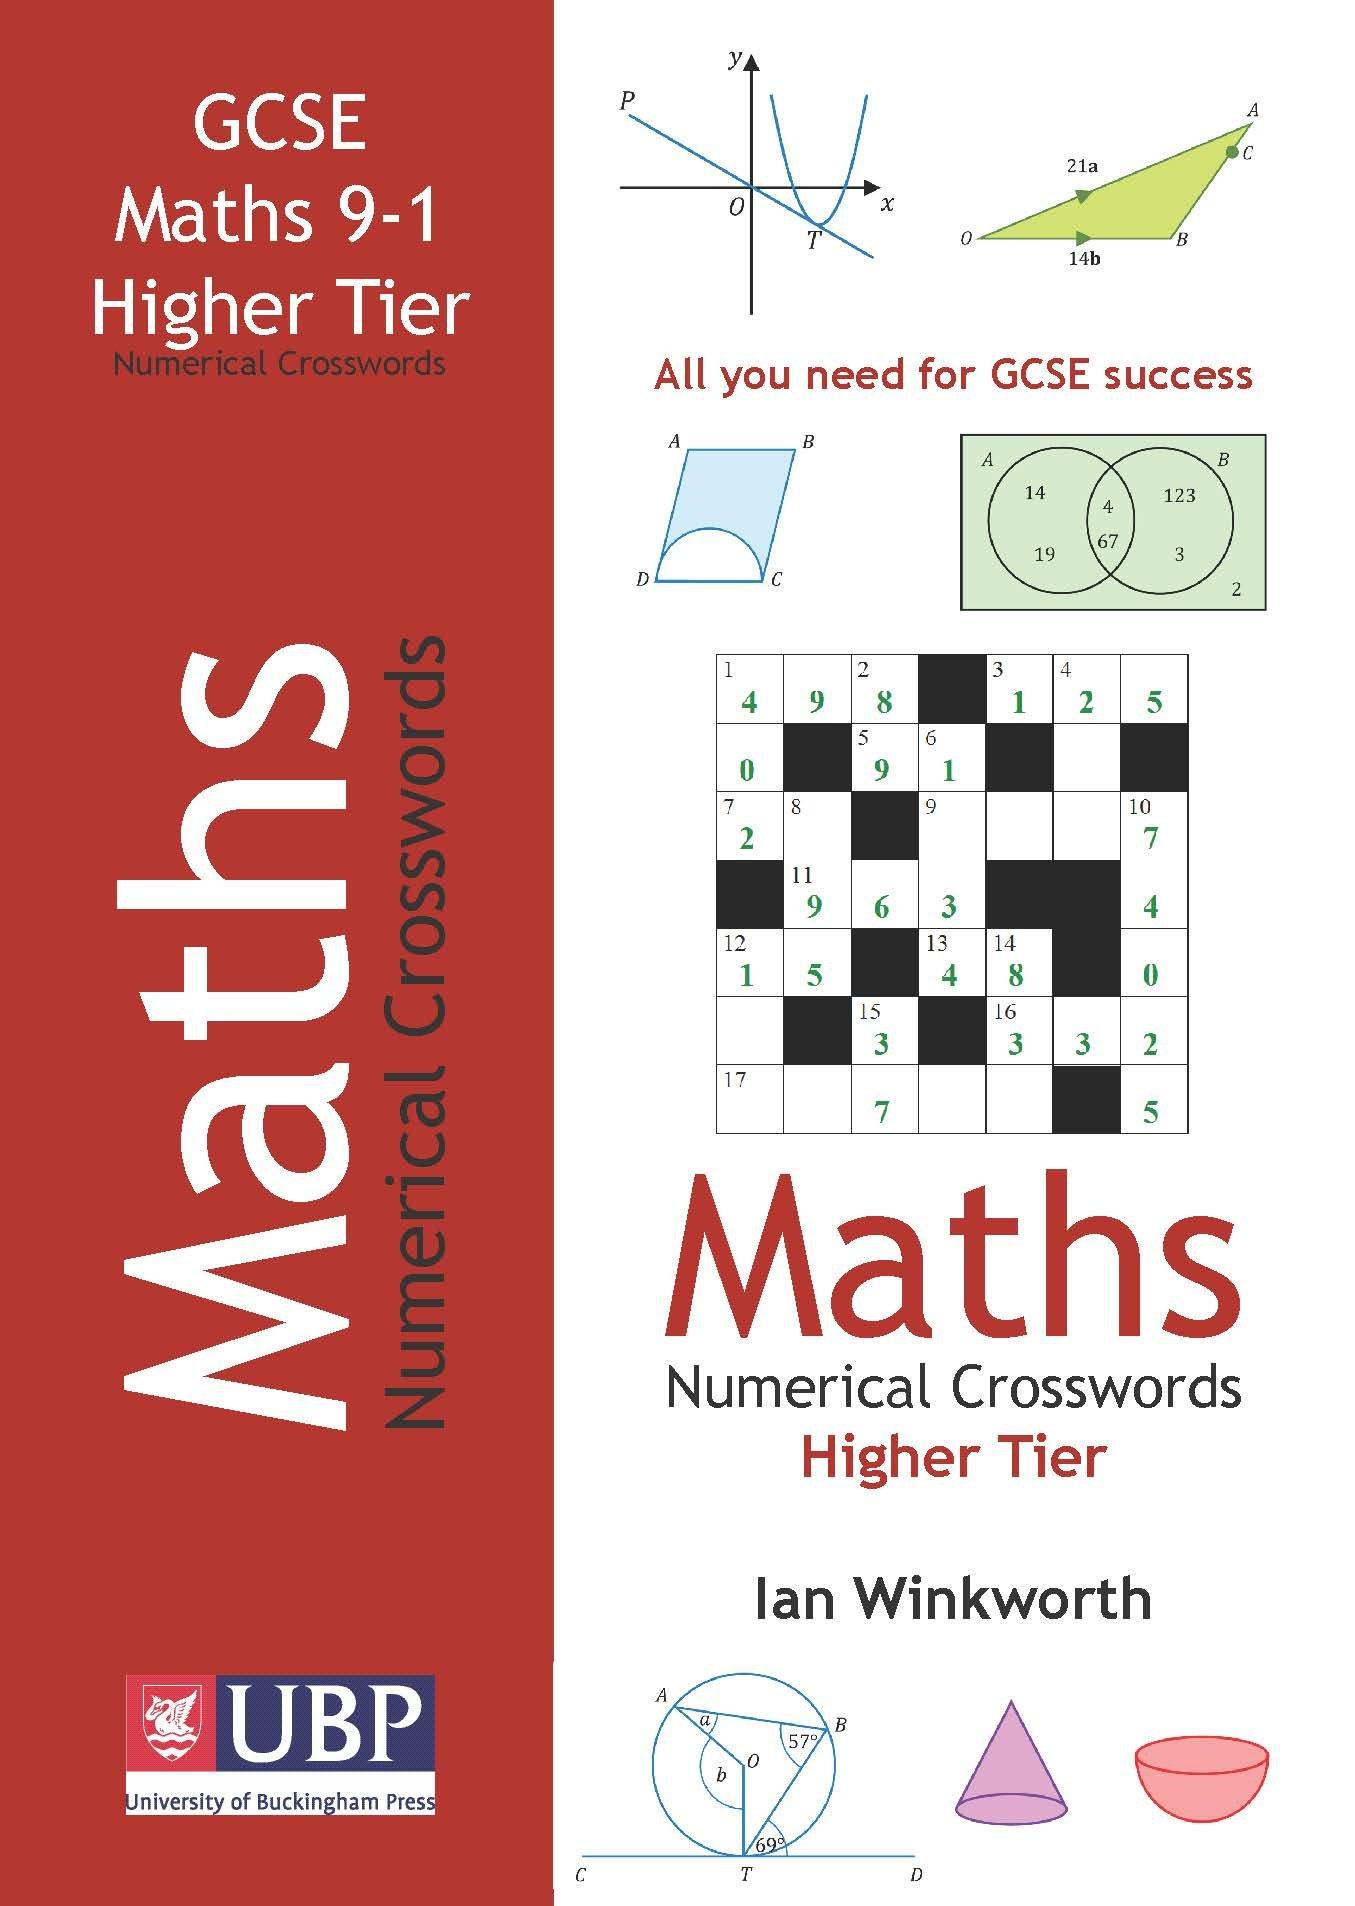 Download GCSE Mathematics Numerical Crosswords Higher Tier (written for the GCSE 9-1 Course) pdf